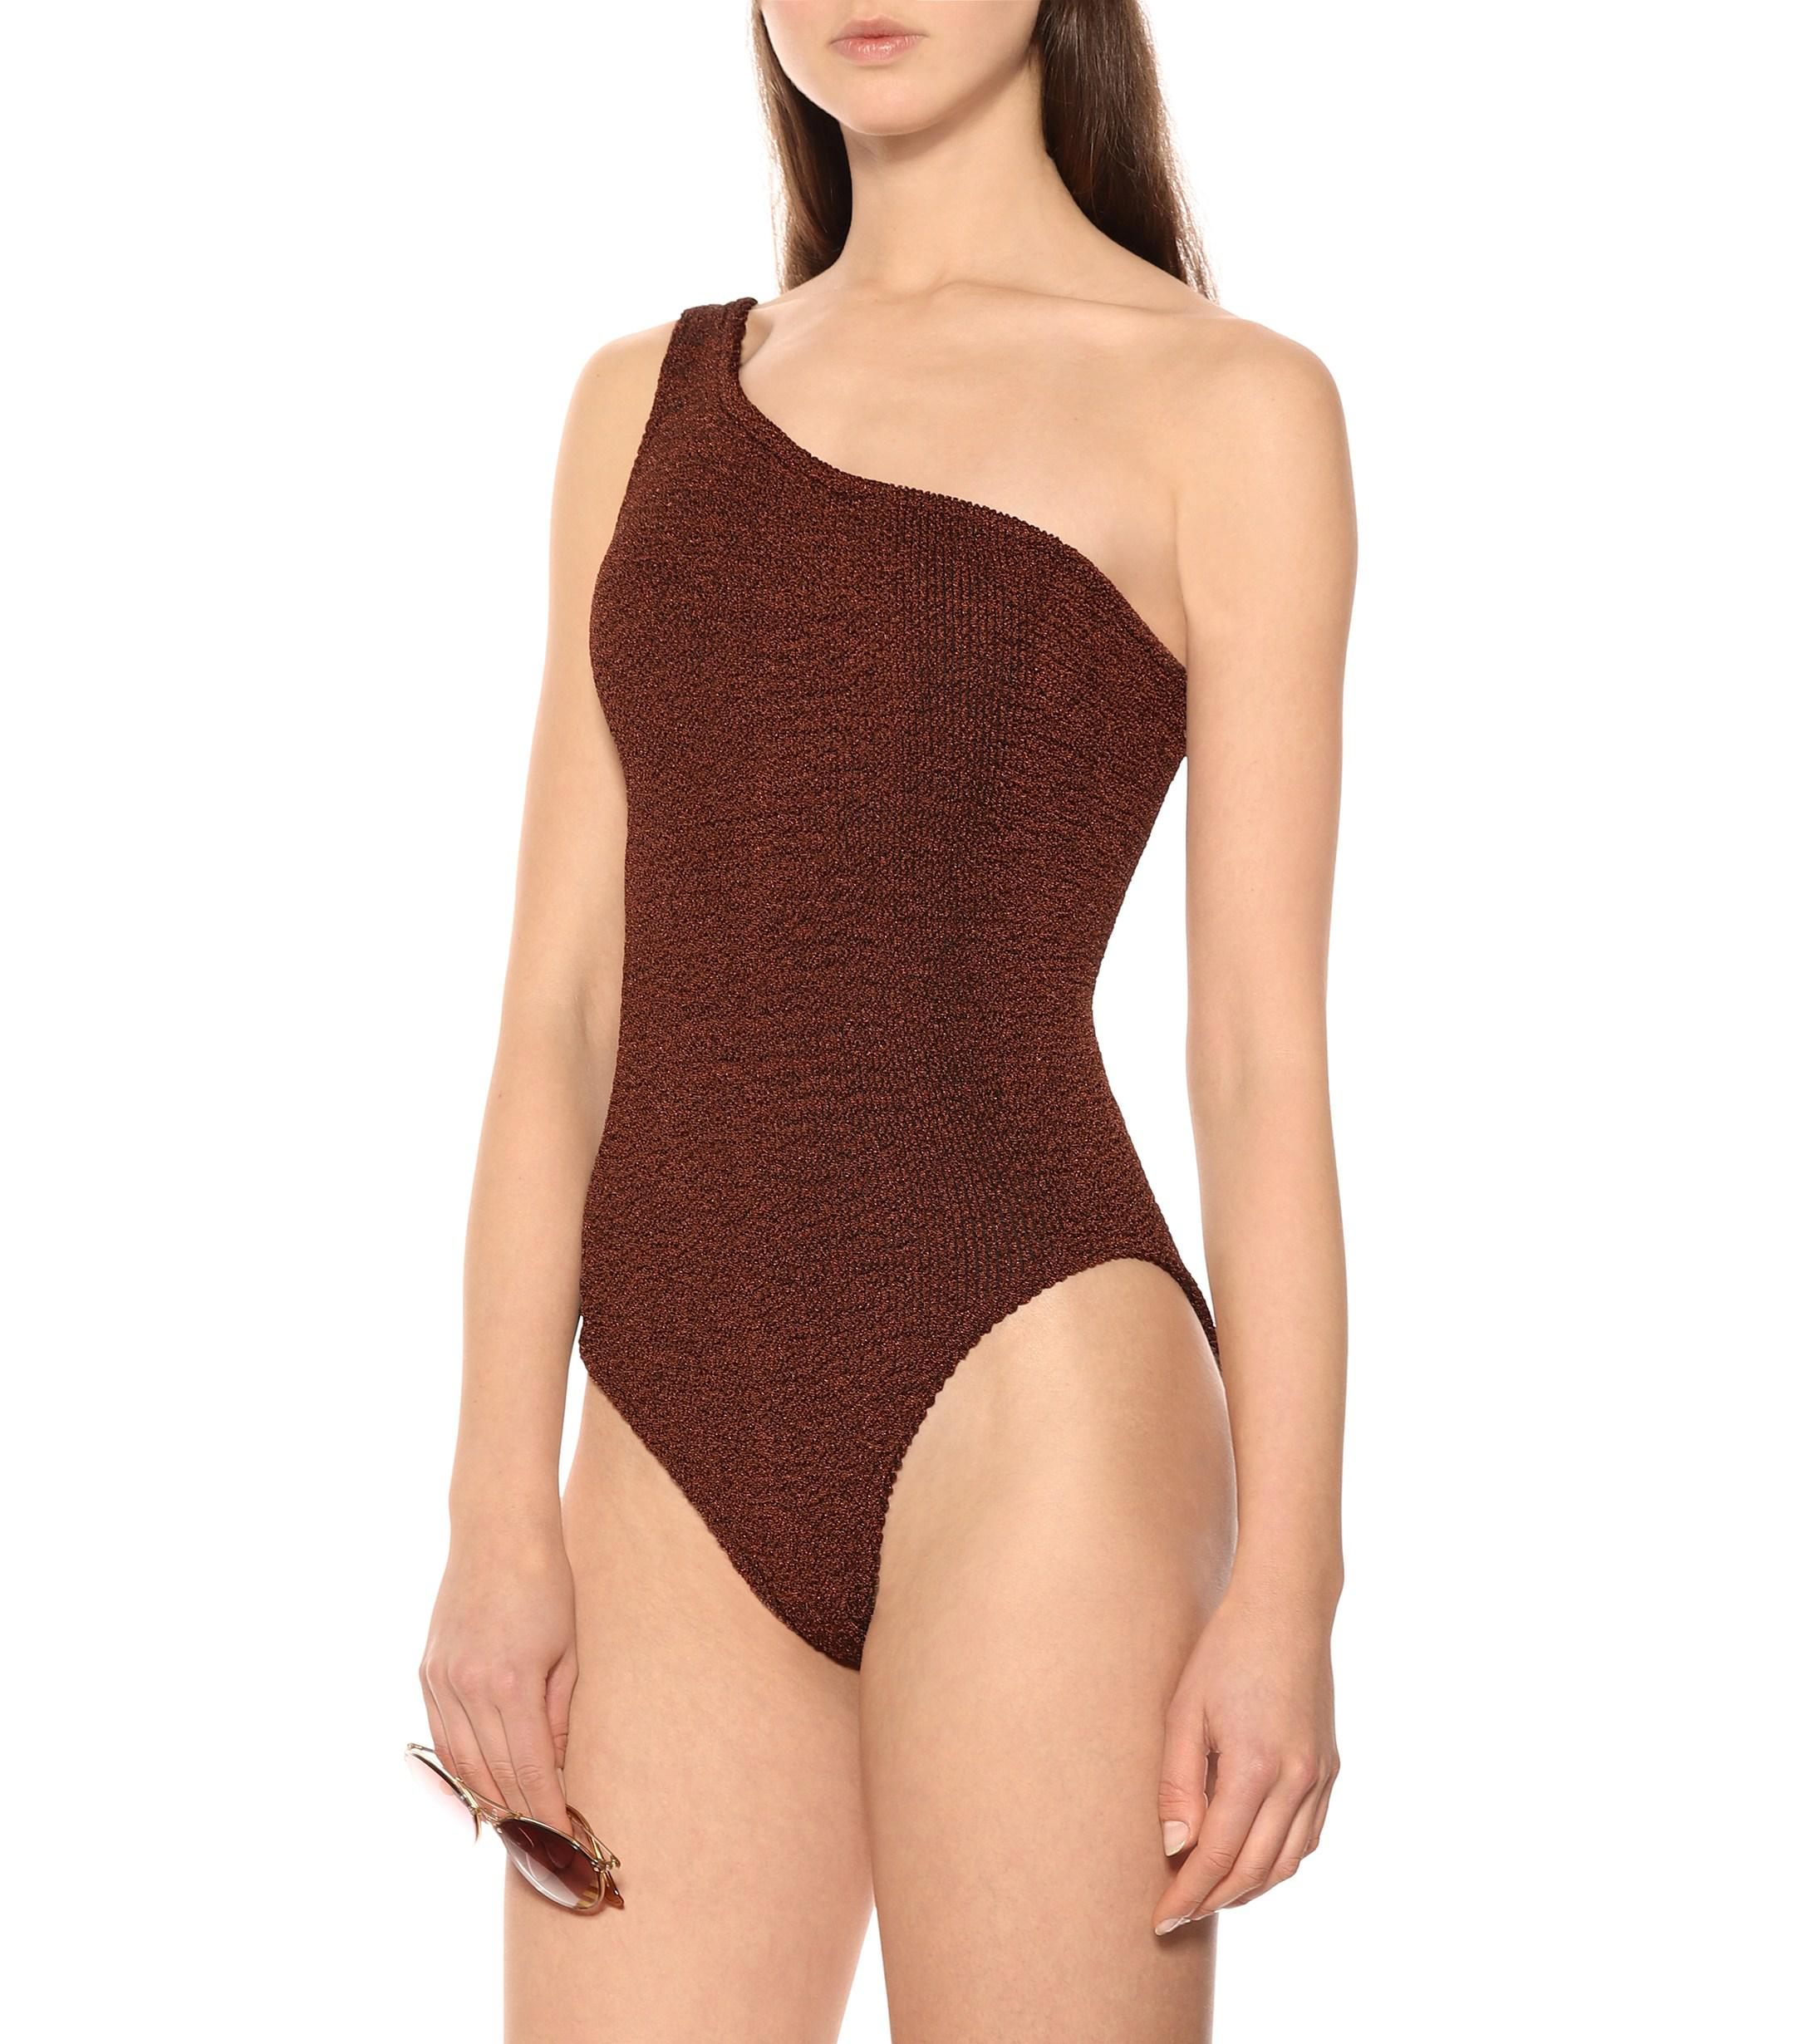 613b77e6579a5 Hunza G - Brown Nancy One-piece Swimsuit - Lyst. View fullscreen